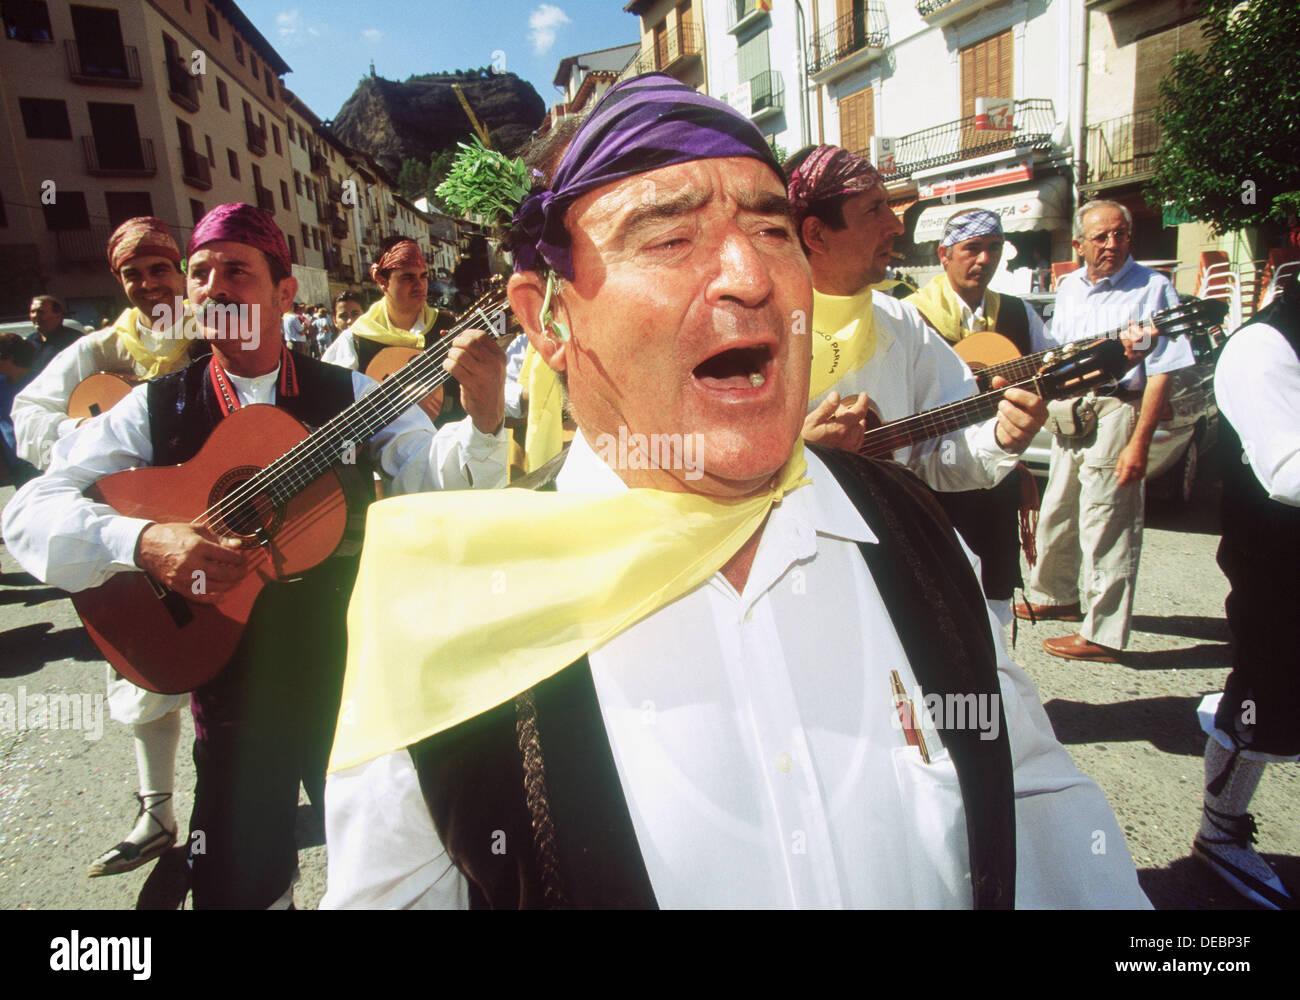 Folk music during local festivity. Graus. Huesca province. Spain - Stock Image